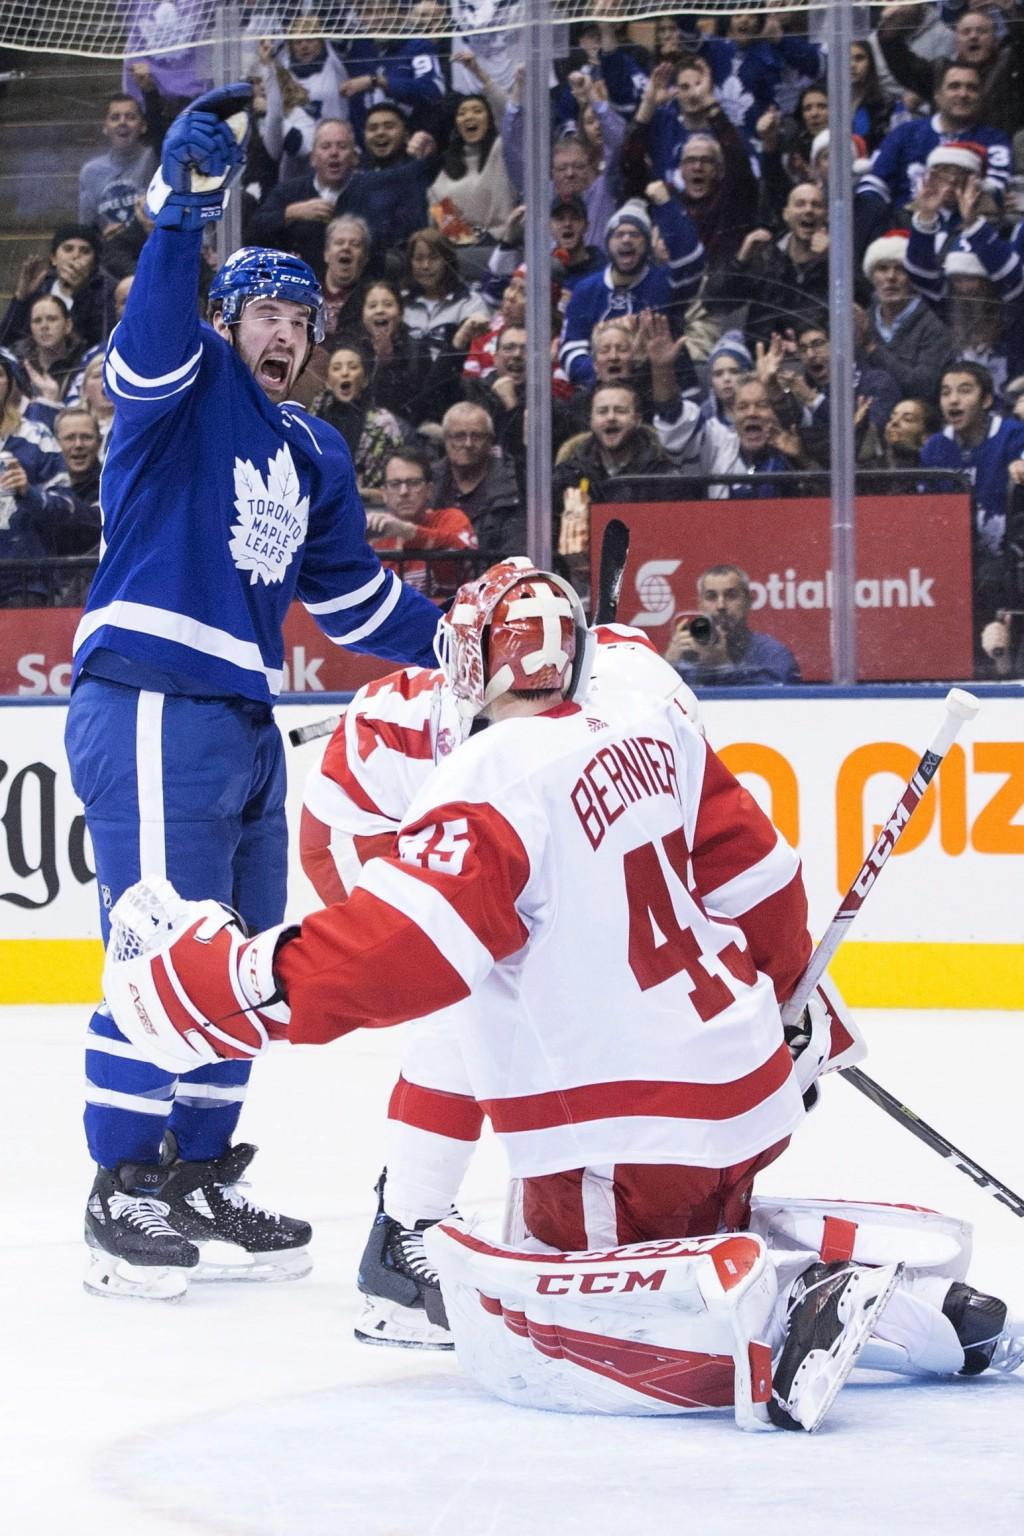 Toronto Maple Leafs Frederik Gauthier celebrates scoring a goal on Detroit Red Wings goaltender Jonathan Bernier during second period NHL hockey actio...